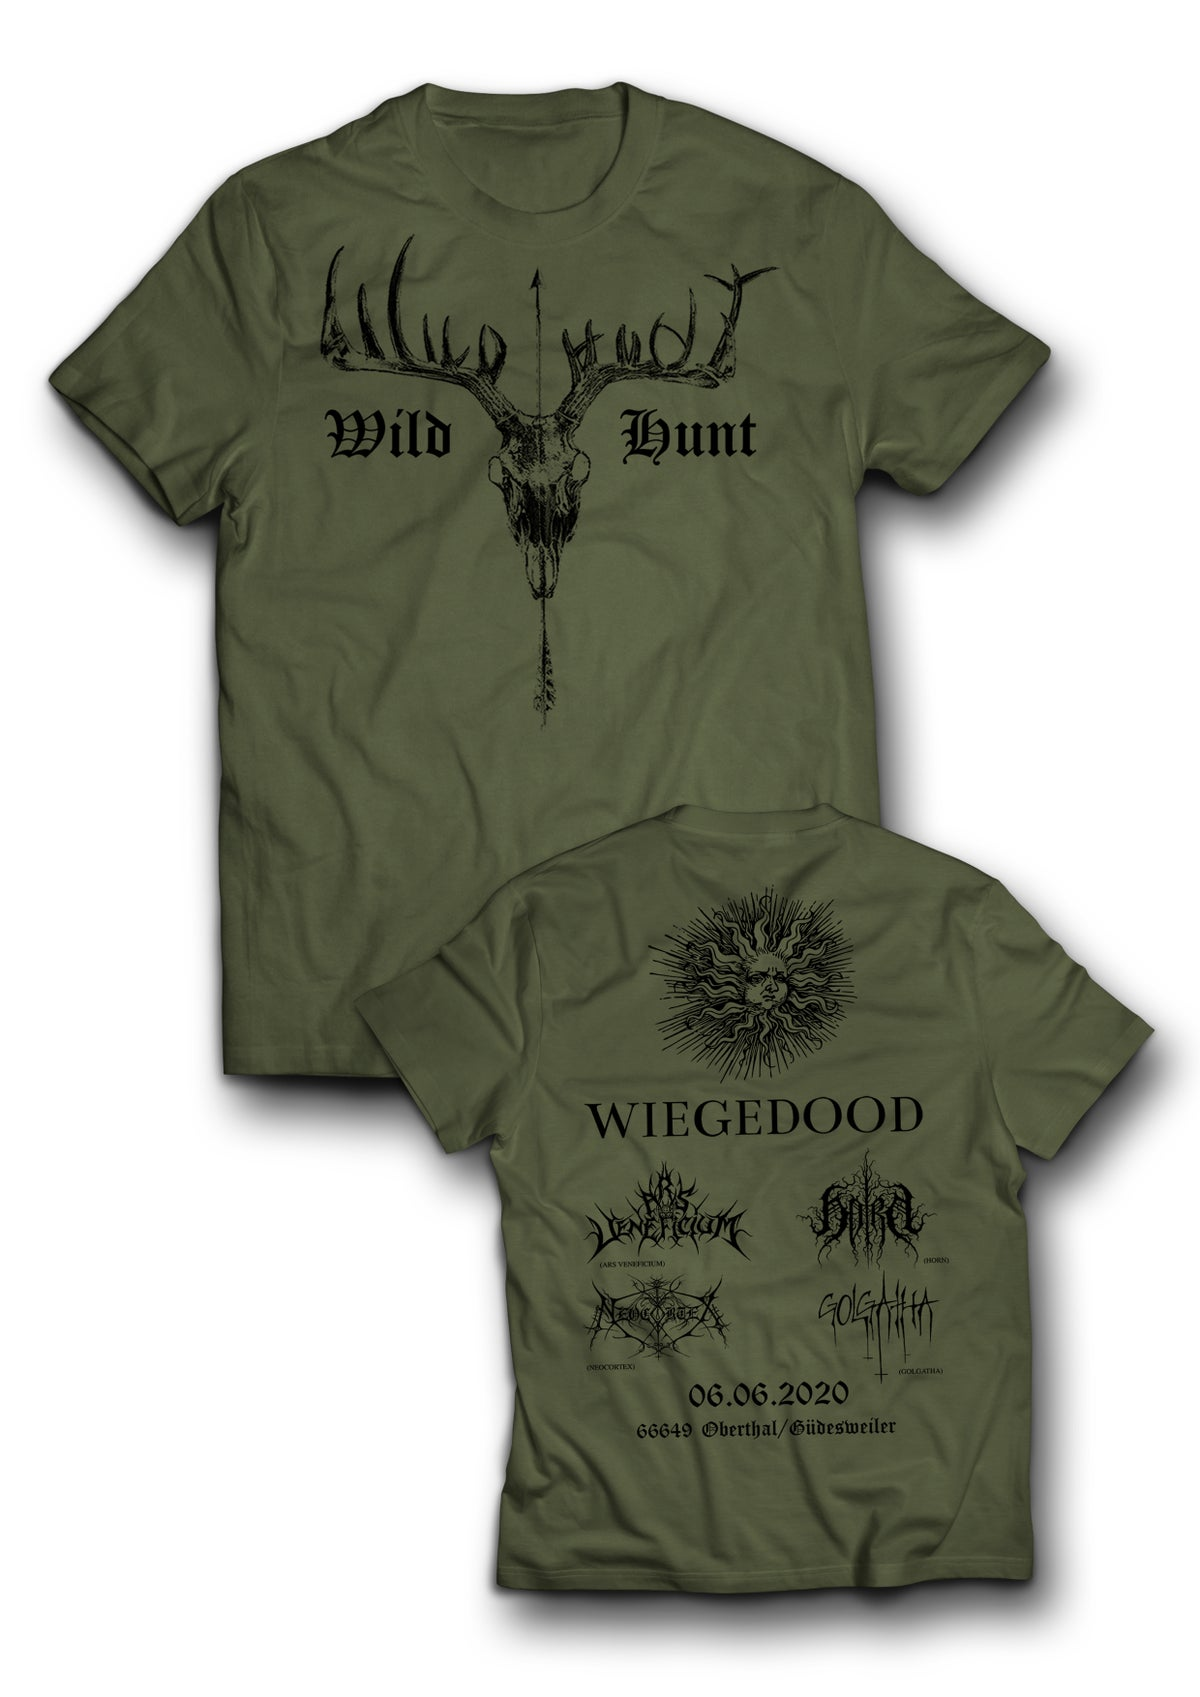 Image of T-Shirt - Olivgrün - Wild Hunt Open Air MMXX